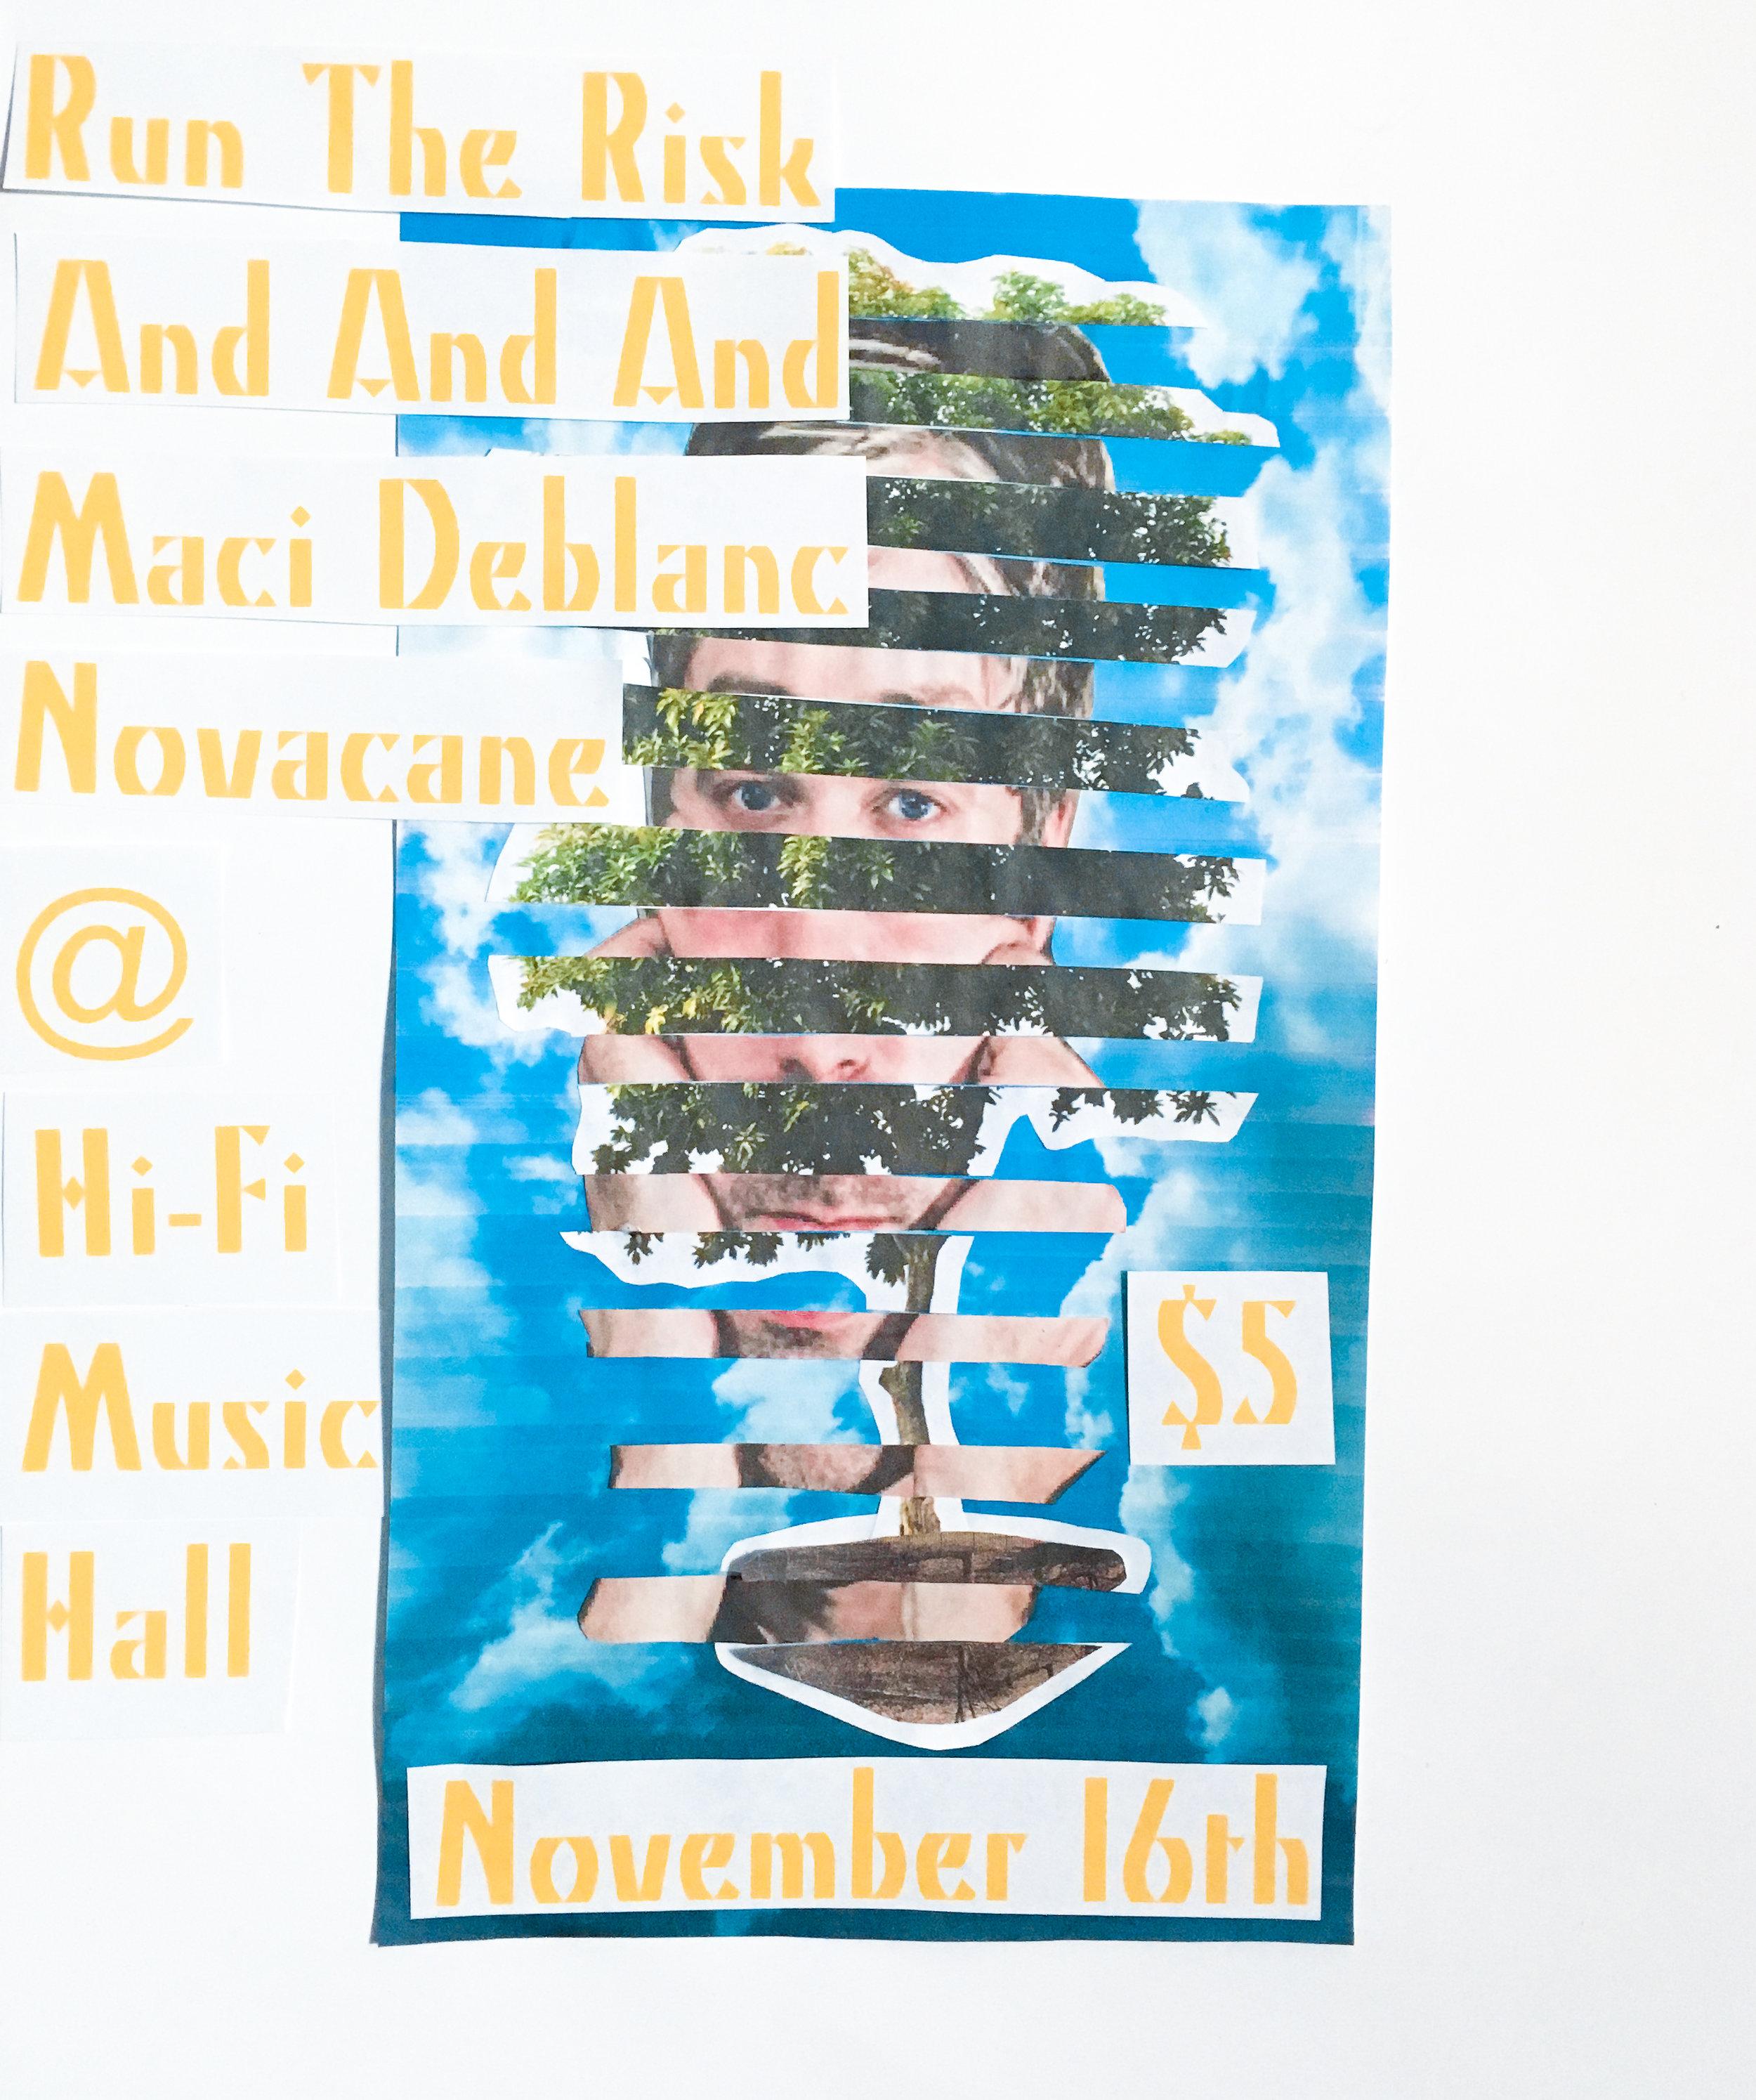 HiFi Music Hall 11/16/2018